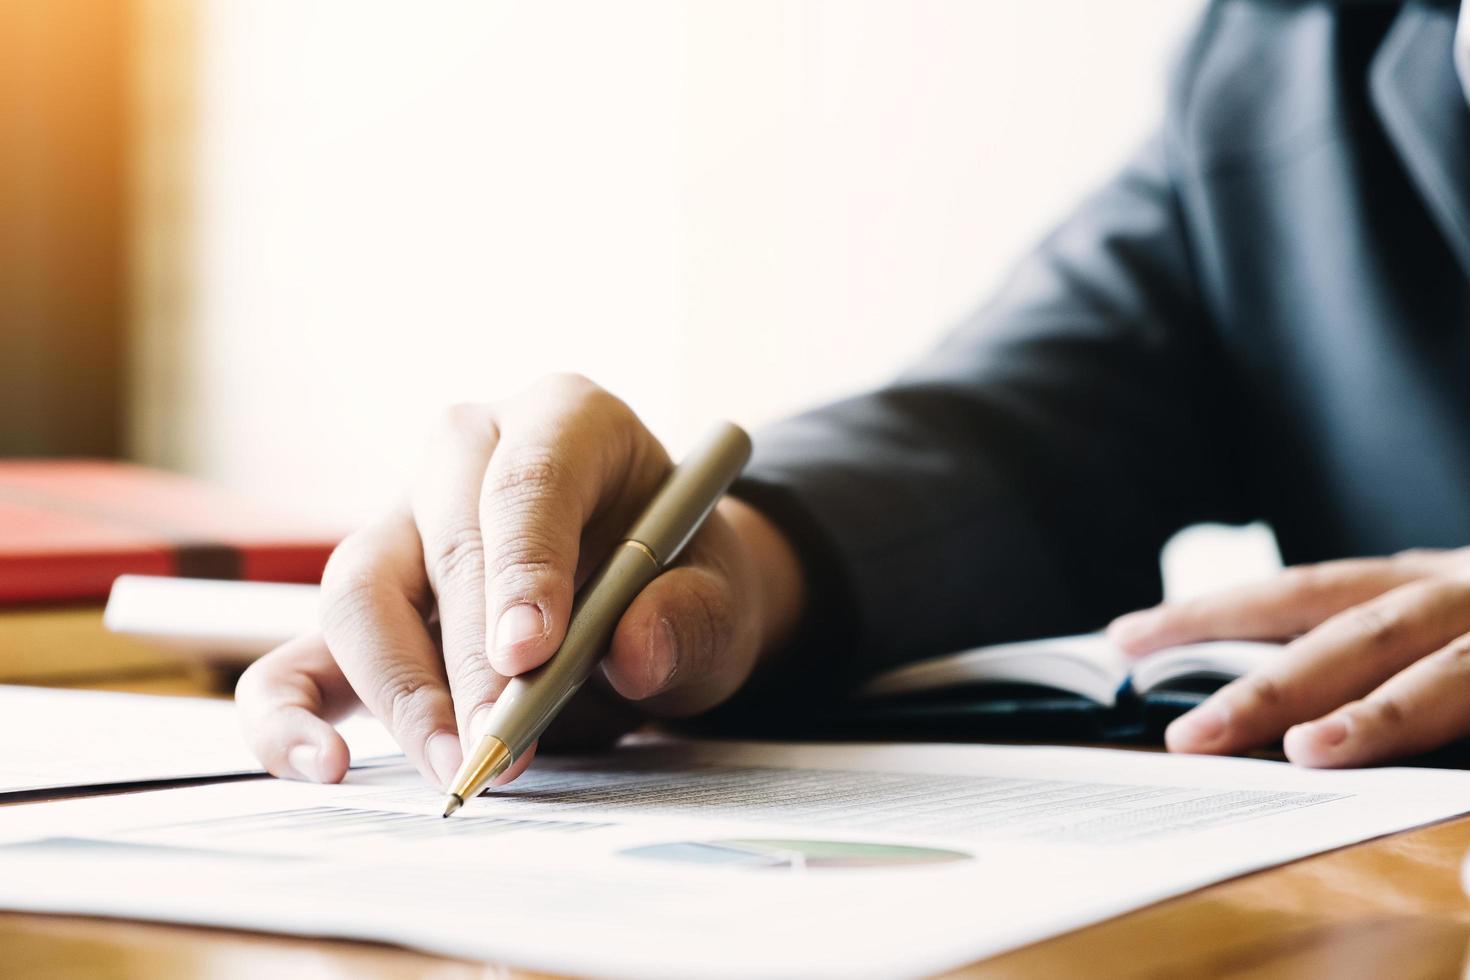 Imagen obtenida de: https://static.vecteezy.com/system/resources/previews/001/269/424/non_2x/close-up-of-businessman-writing-on-report-free-photo.jpg